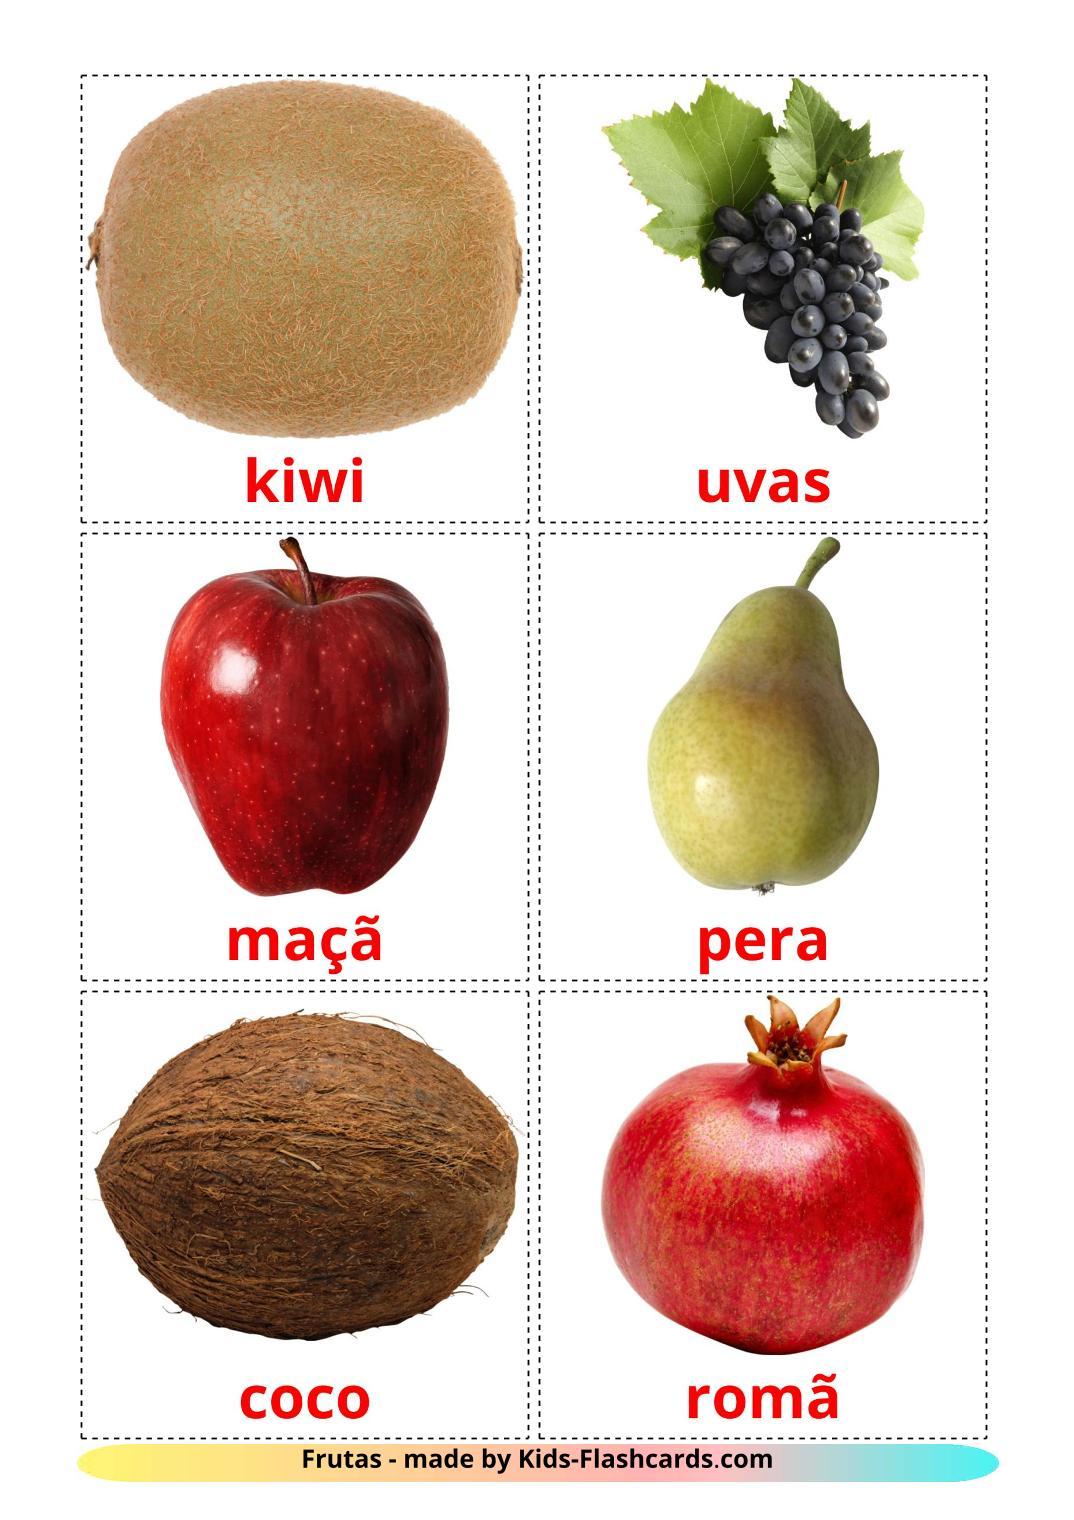 Fruits - 20 Free Printable portuguese Flashcards